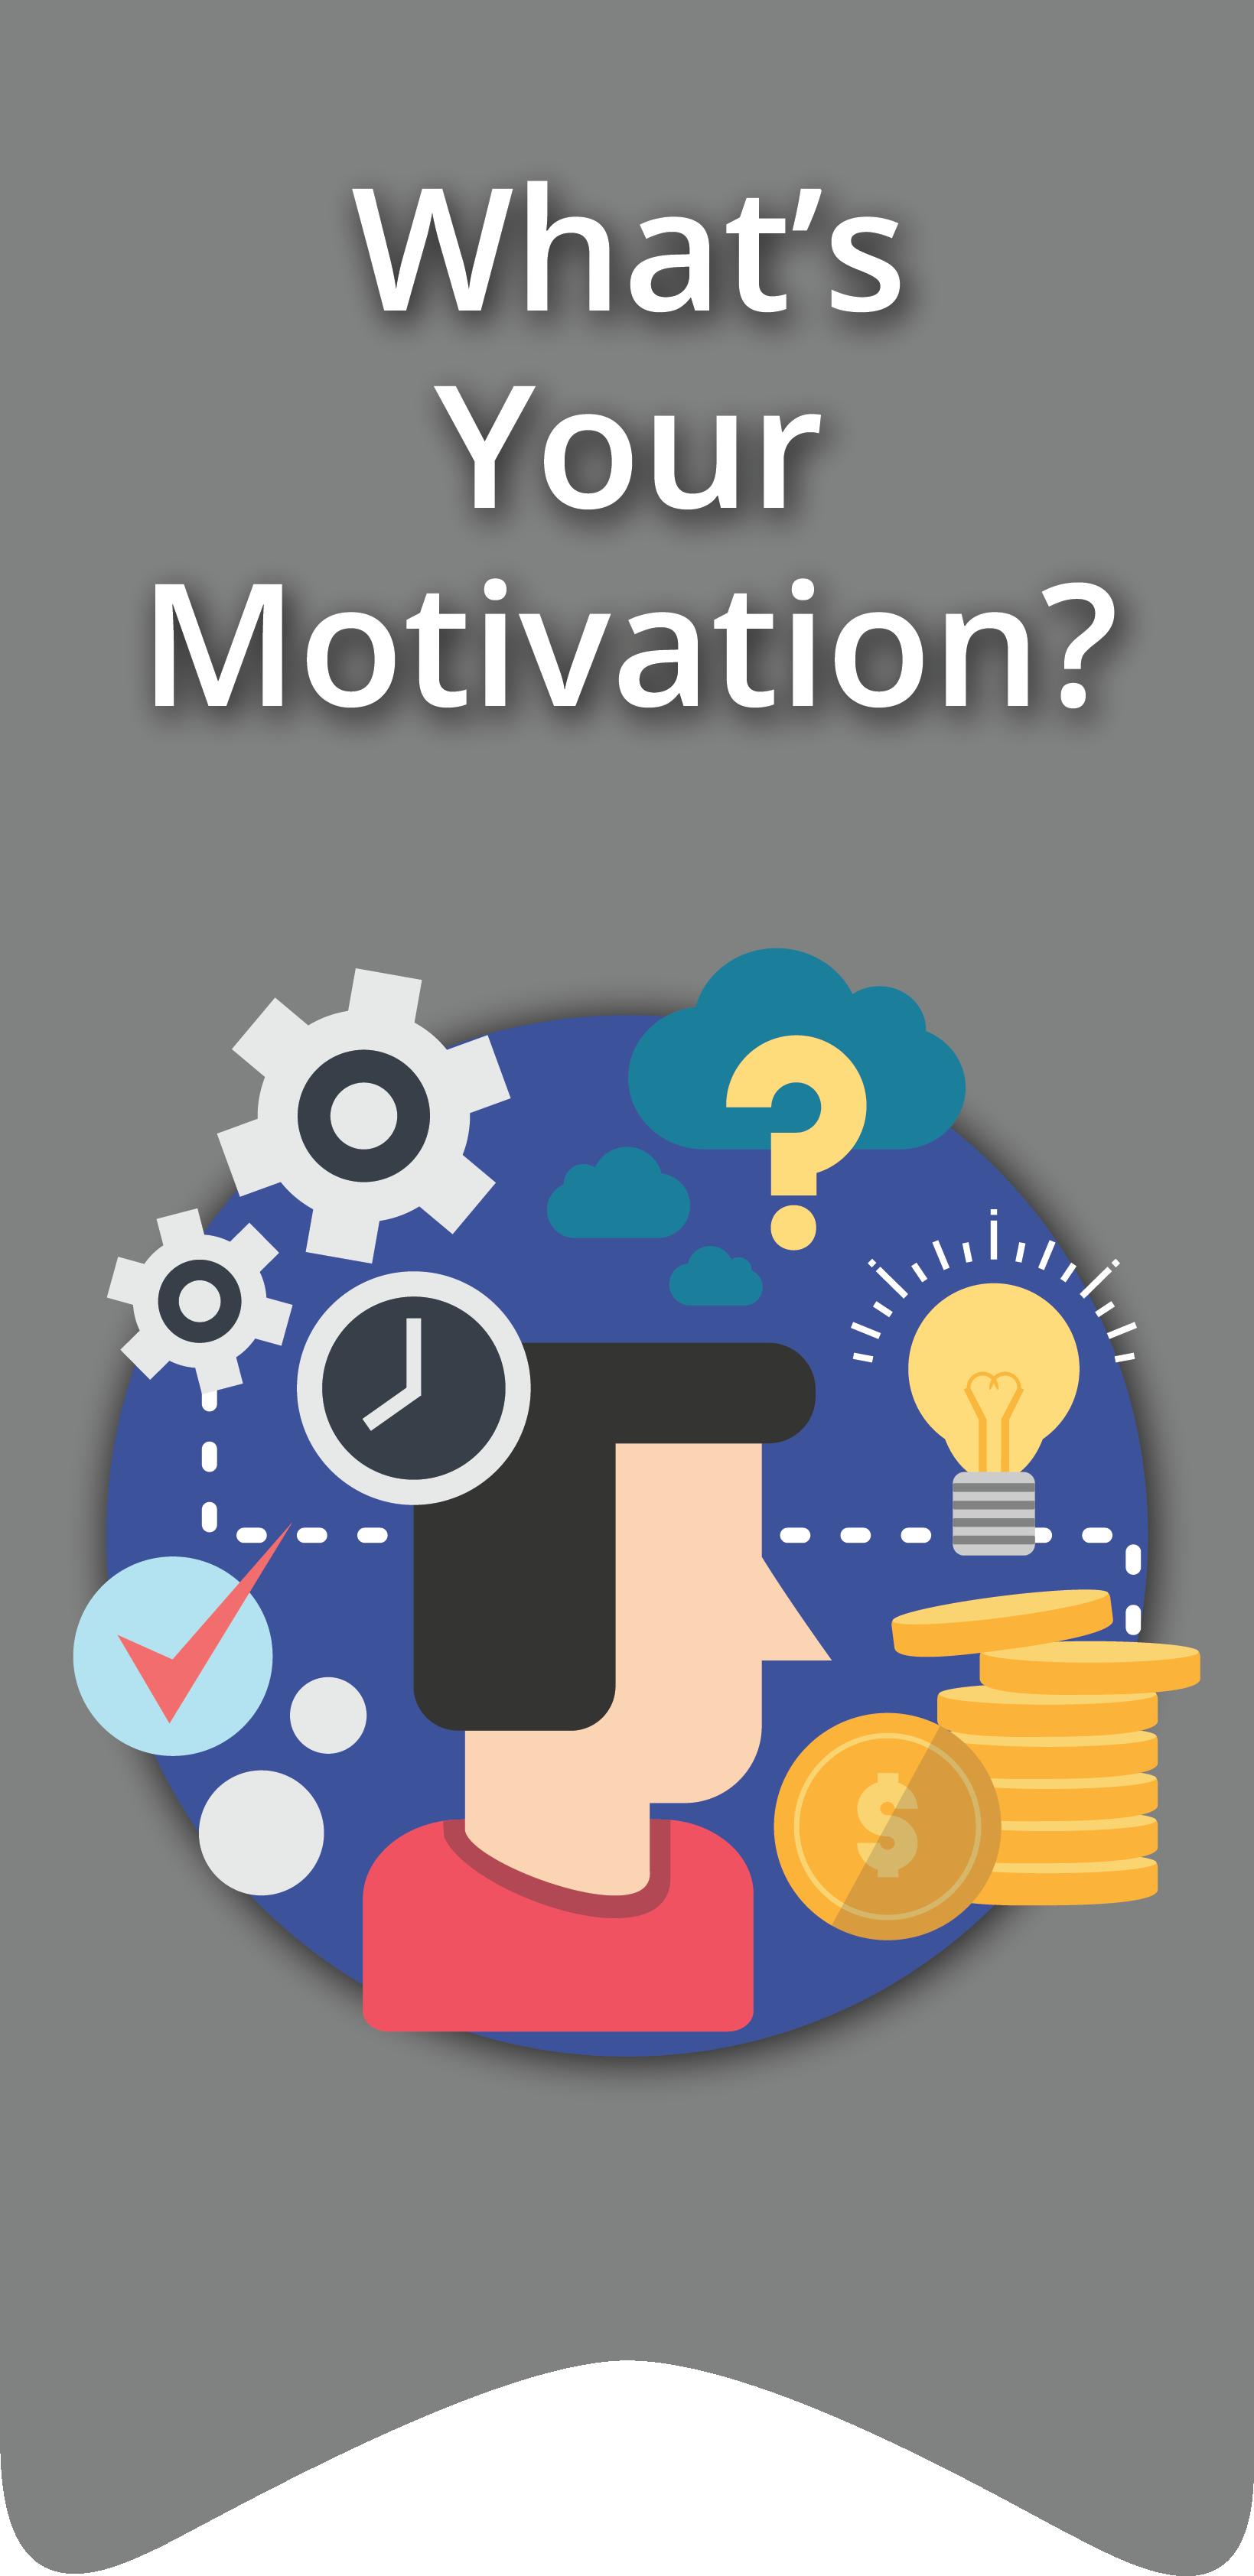 business plan, business motivation, small business